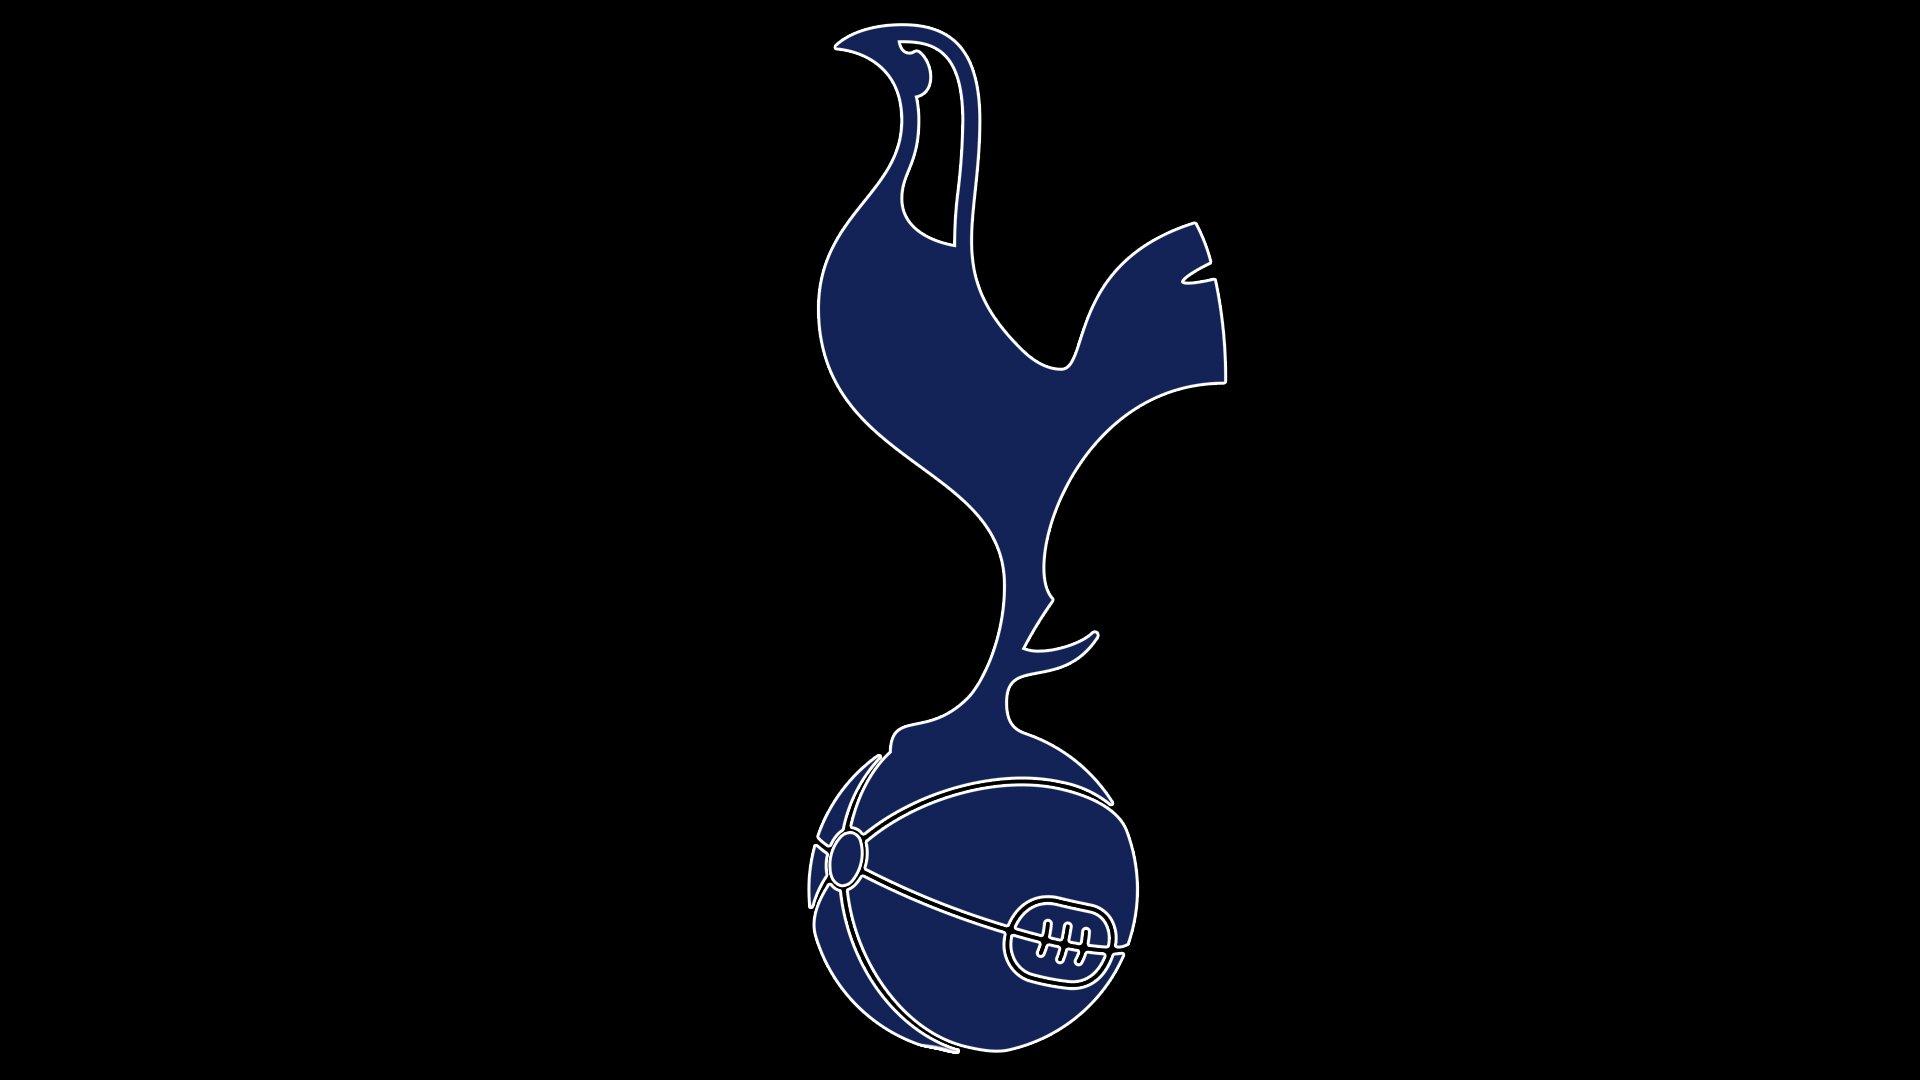 Tottenham Hotspur Logo,Tottenham Hotspur Symbol, Meaning ...